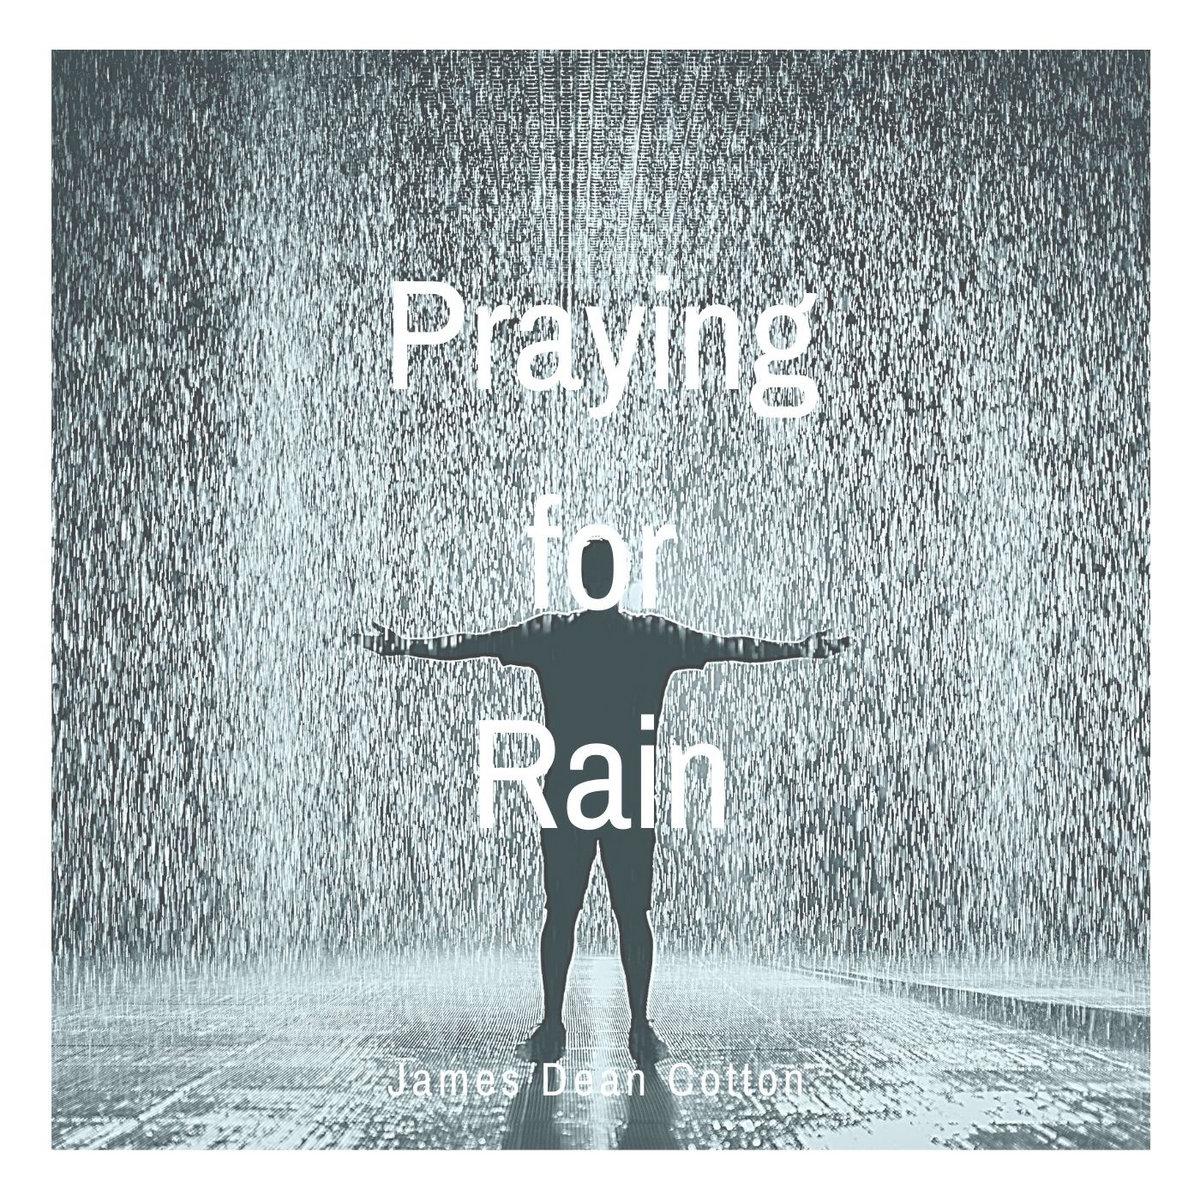 Praying For Rain by James Dean Cotton